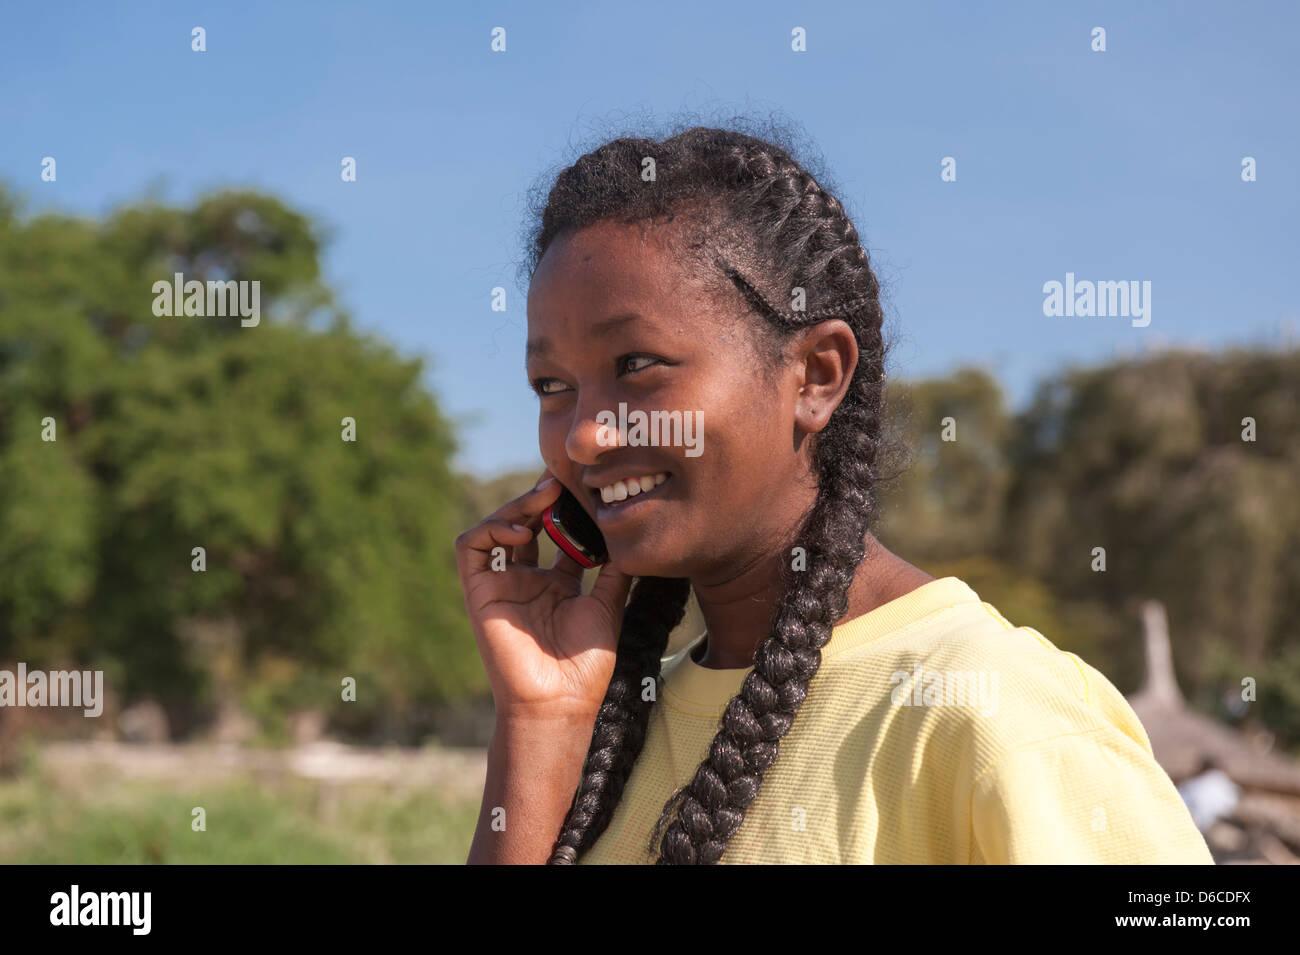 Young Ethiopian woman using her cell phone, Awasa, Ethioipia - Stock Image